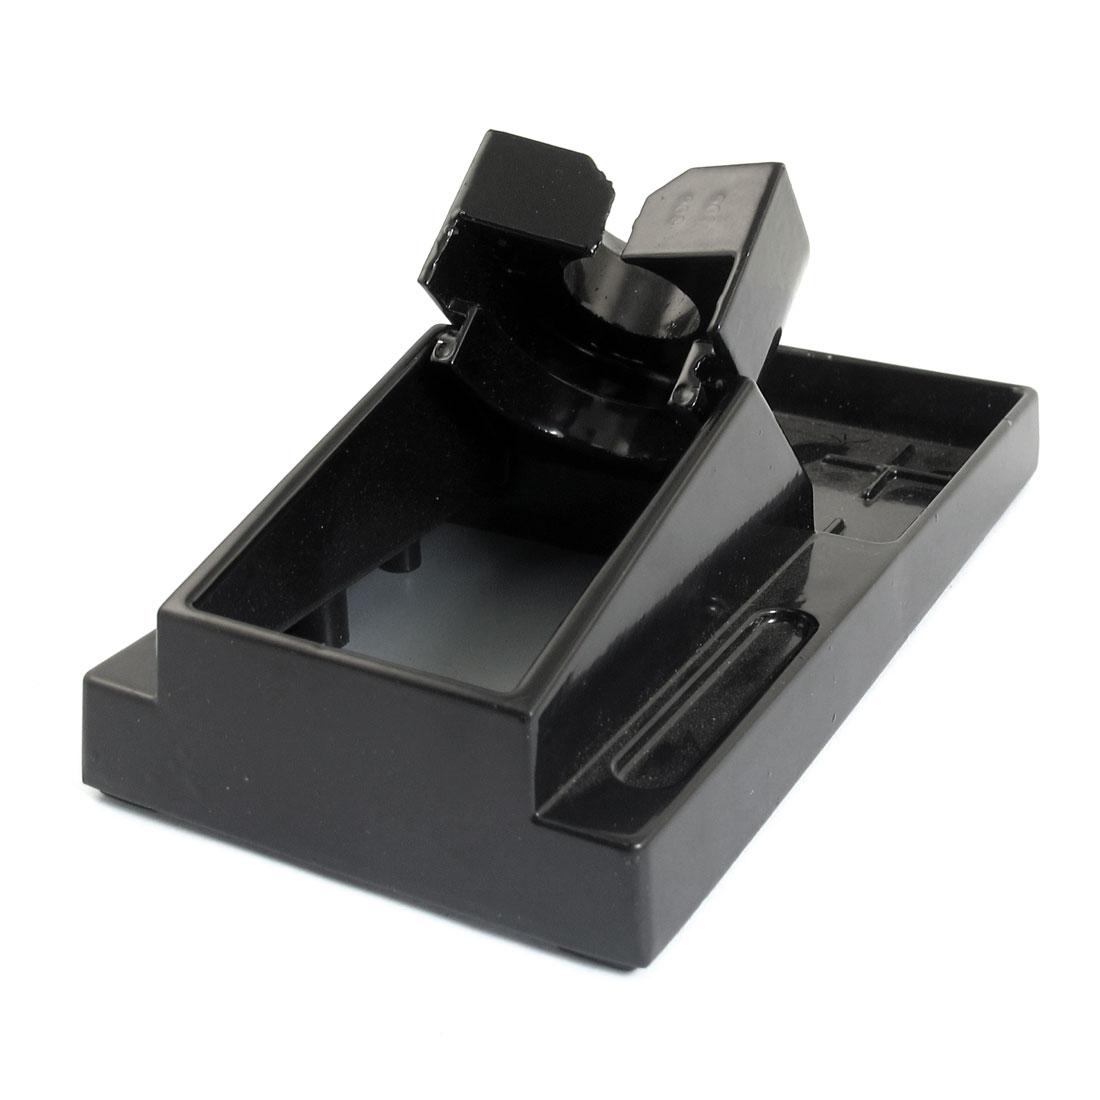 16cm x 8cm Benchtop Base Black Metal Soldering Iron Stand Holder